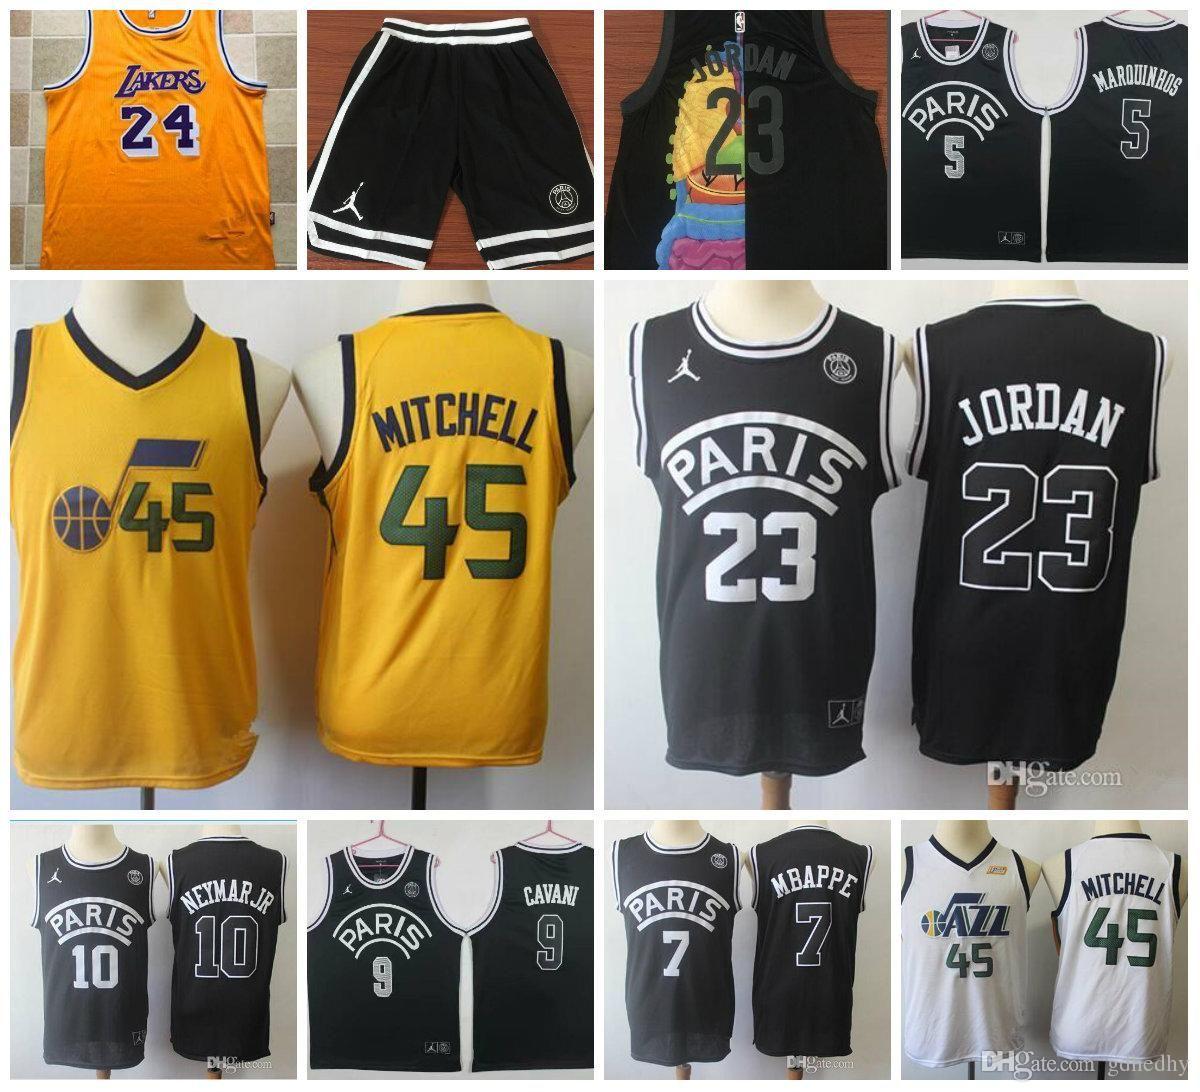 6888c9a92875 2019 TOP High Quality Men S AJ PSG Bulls 23 MJ 10 Jr Jersey 45 Mitchell 24  Bryant 2 Ball Basketball Jerseys Retro Embroidery Jersey